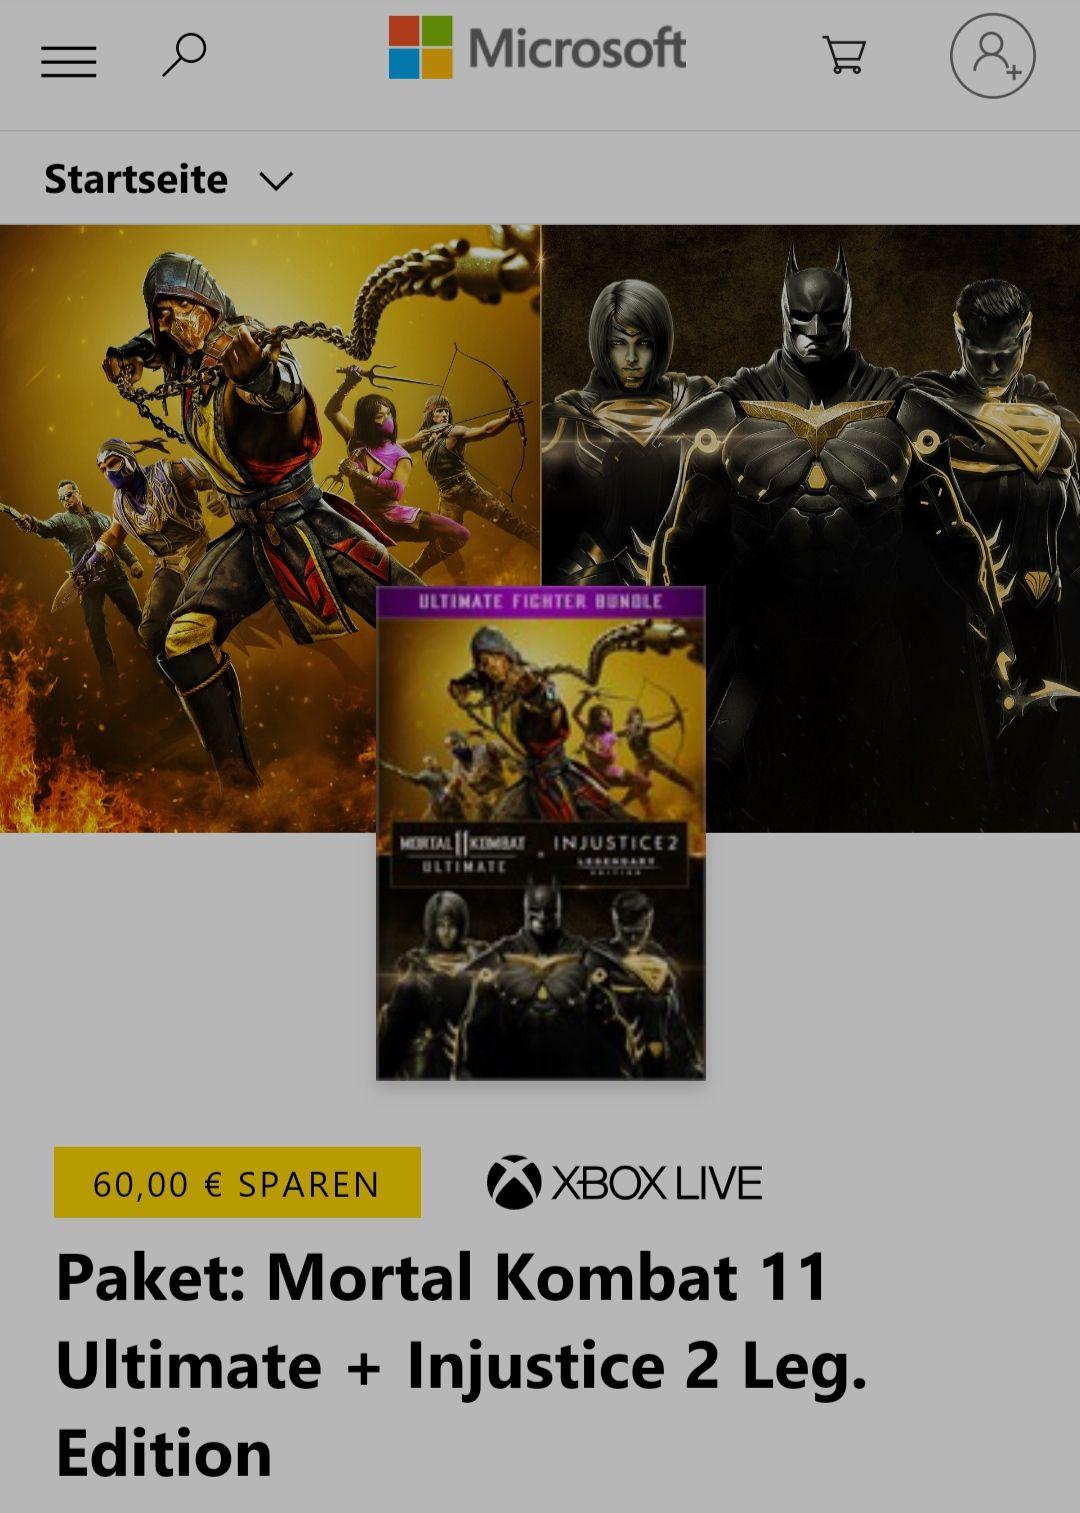 Xbox: Mortal Kombat 11 Ultimate & Injustice 2 Legendary Edition Paketpreis